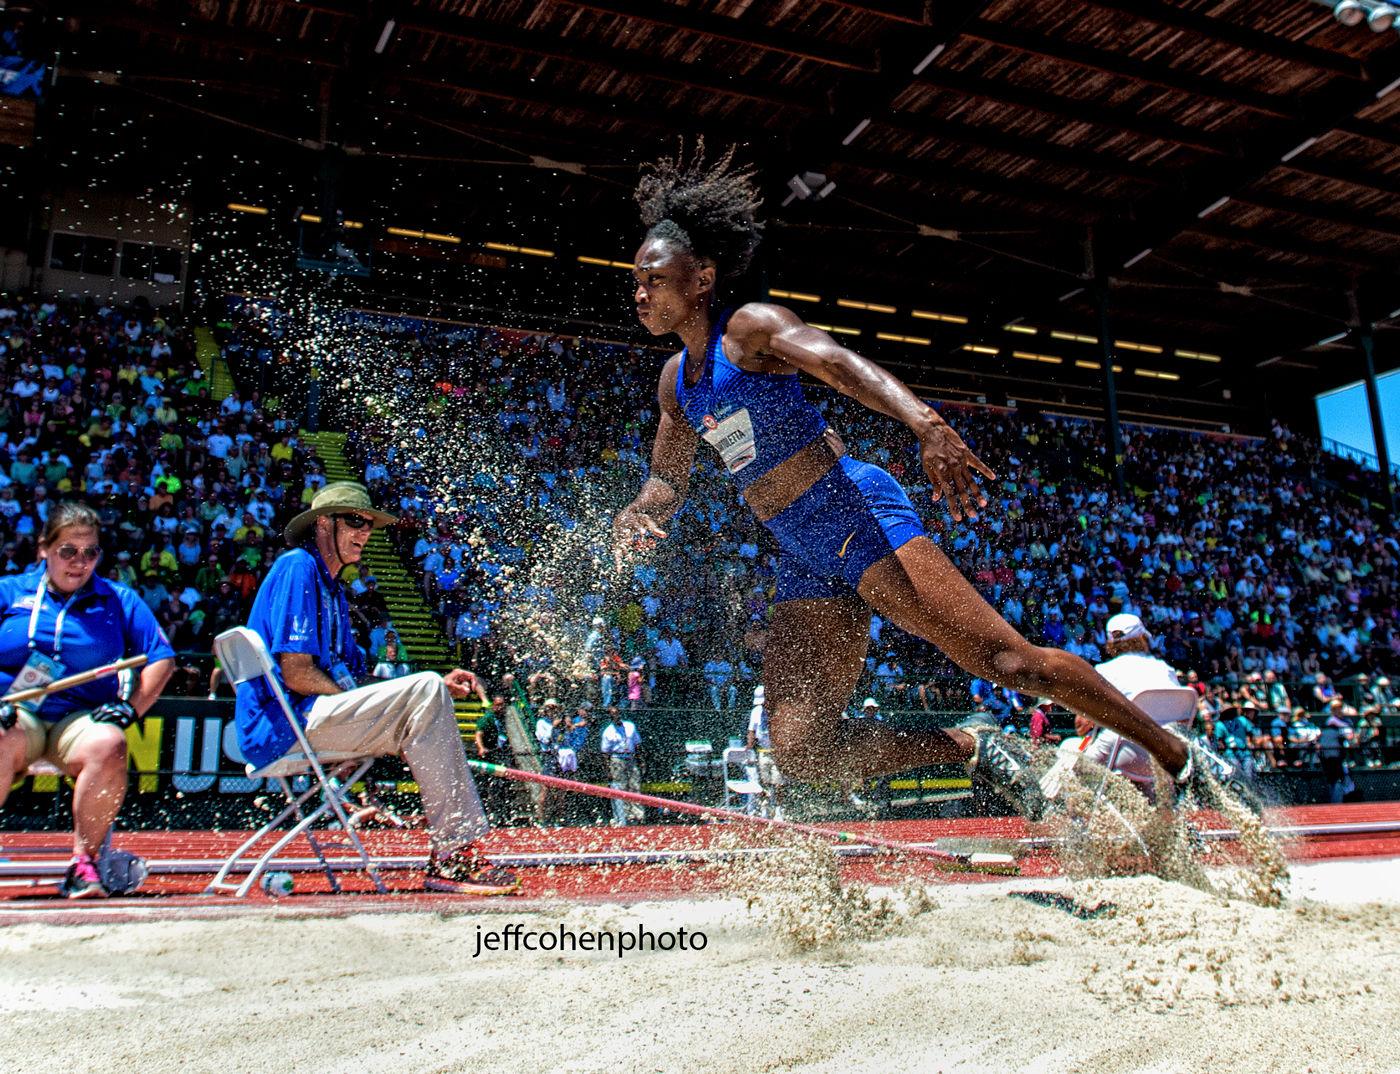 1r2016_oly_trials_day_2_bartoletta_jl_jump_jeff_cohen_photo_9089_web.jpg